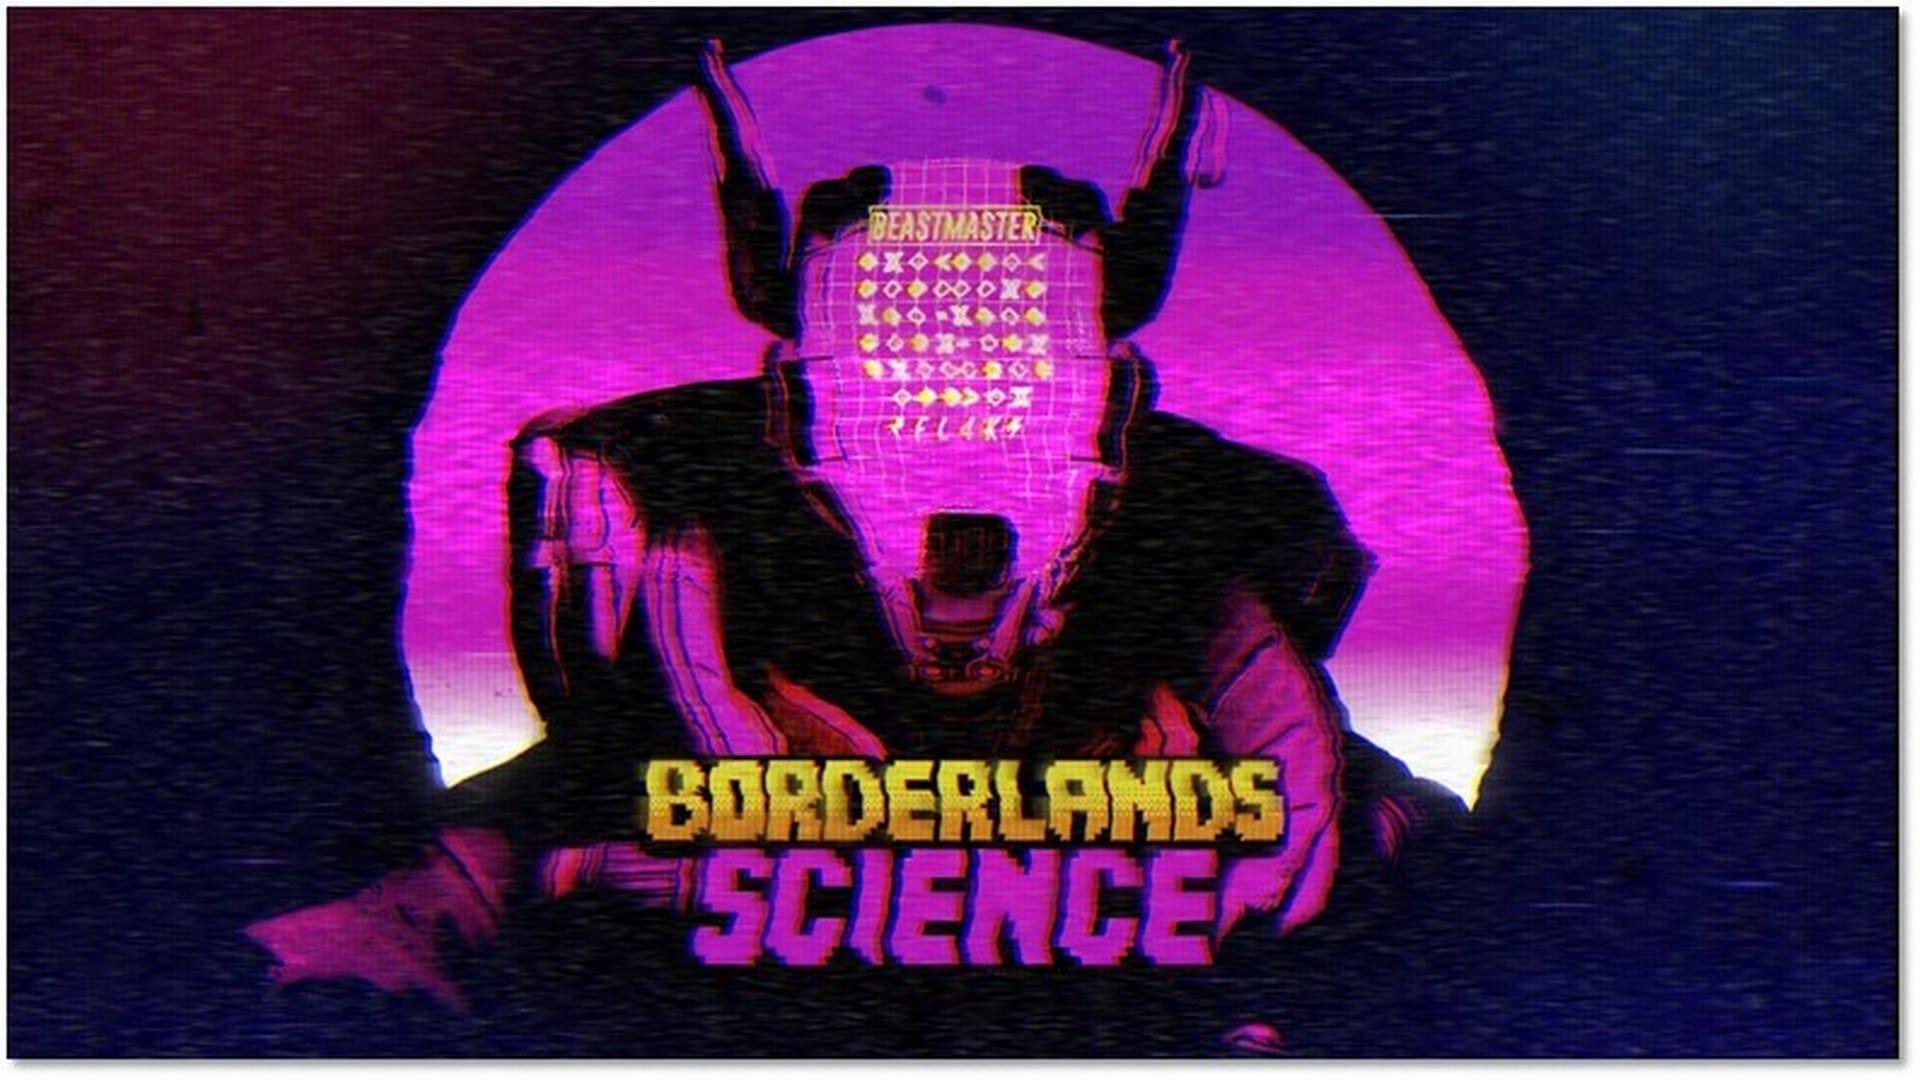 Borderlands 3 – Borderlands Science Helps Advance Scientific Research